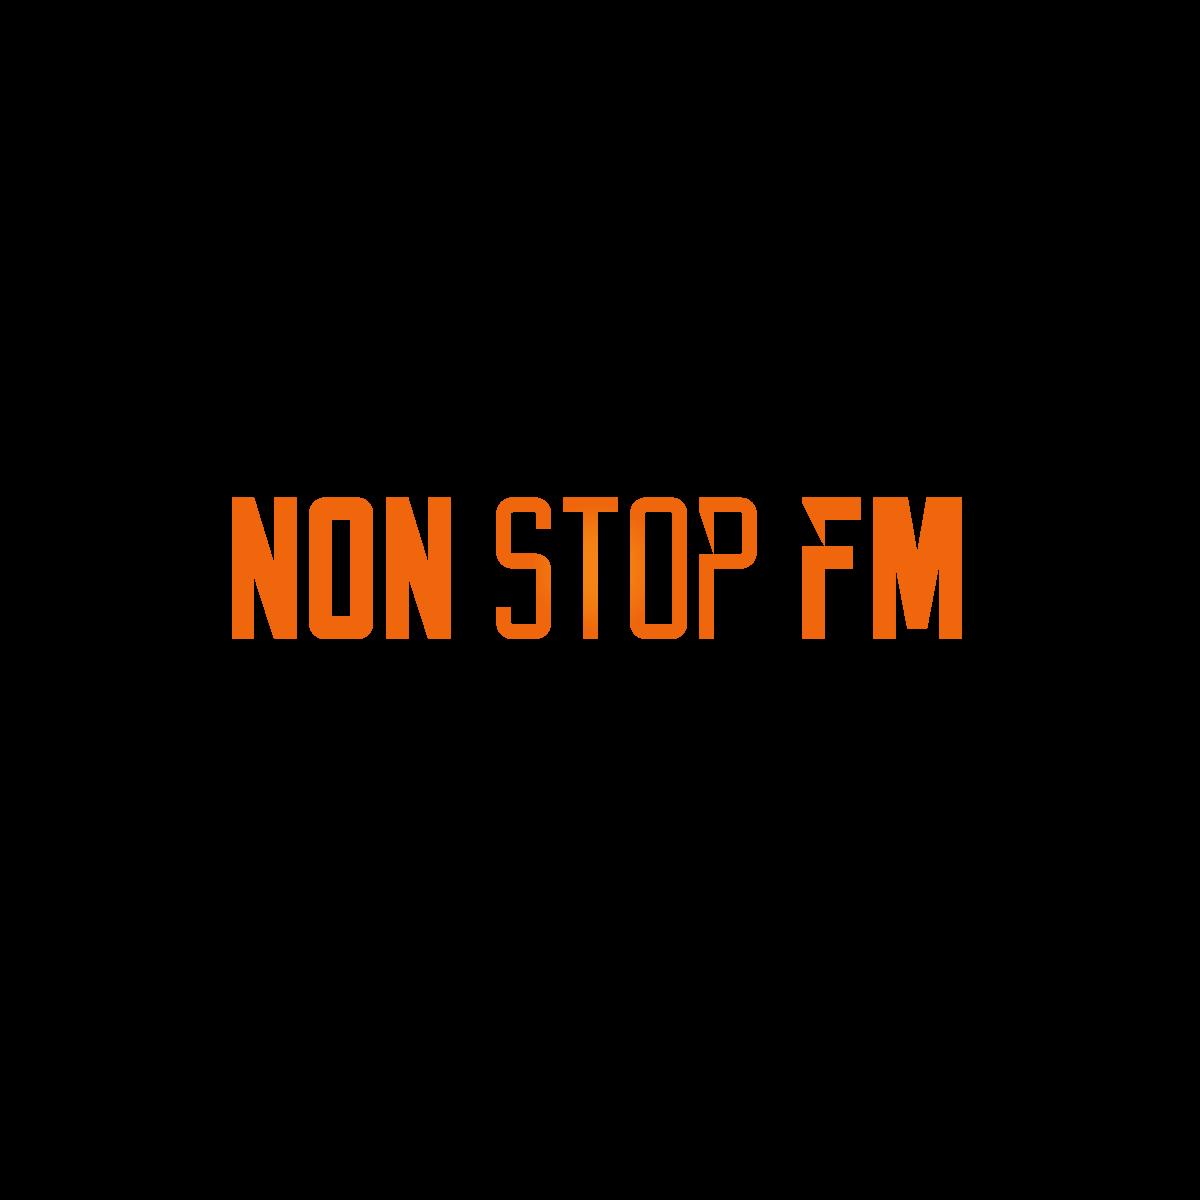 NonStopFM2